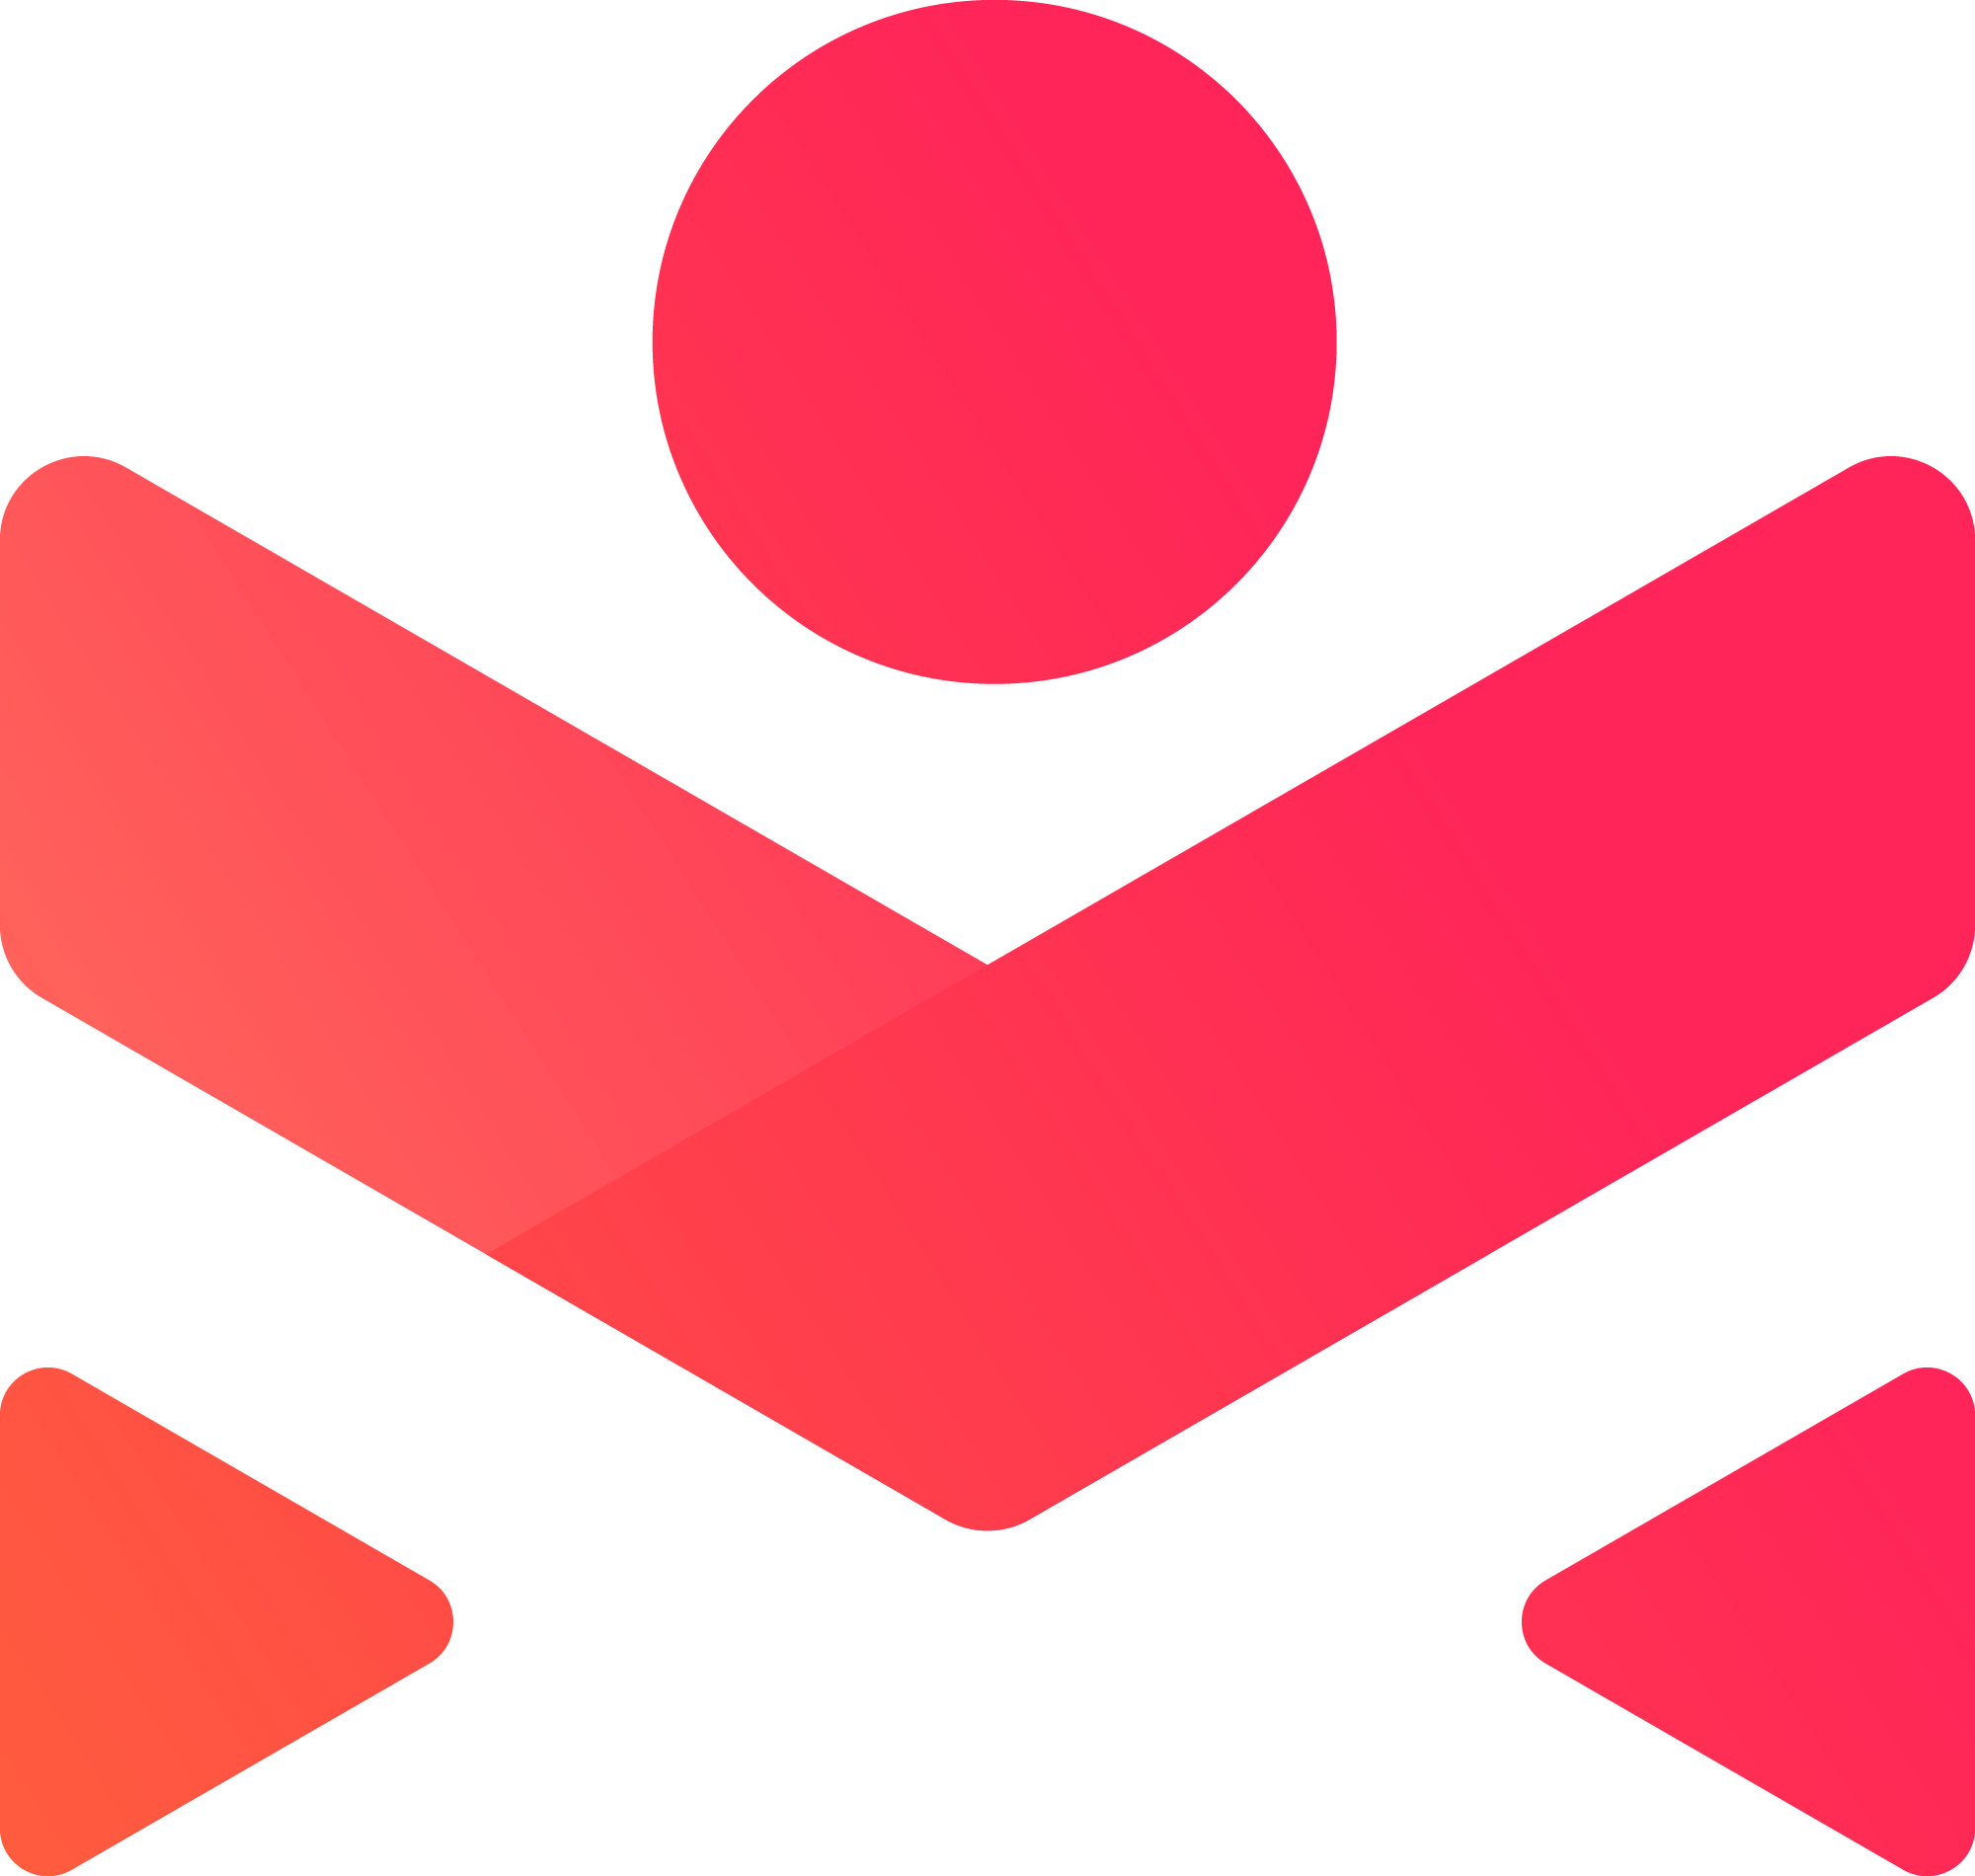 Design a clean, modern logo/icon for a self-improvement hypnosis app